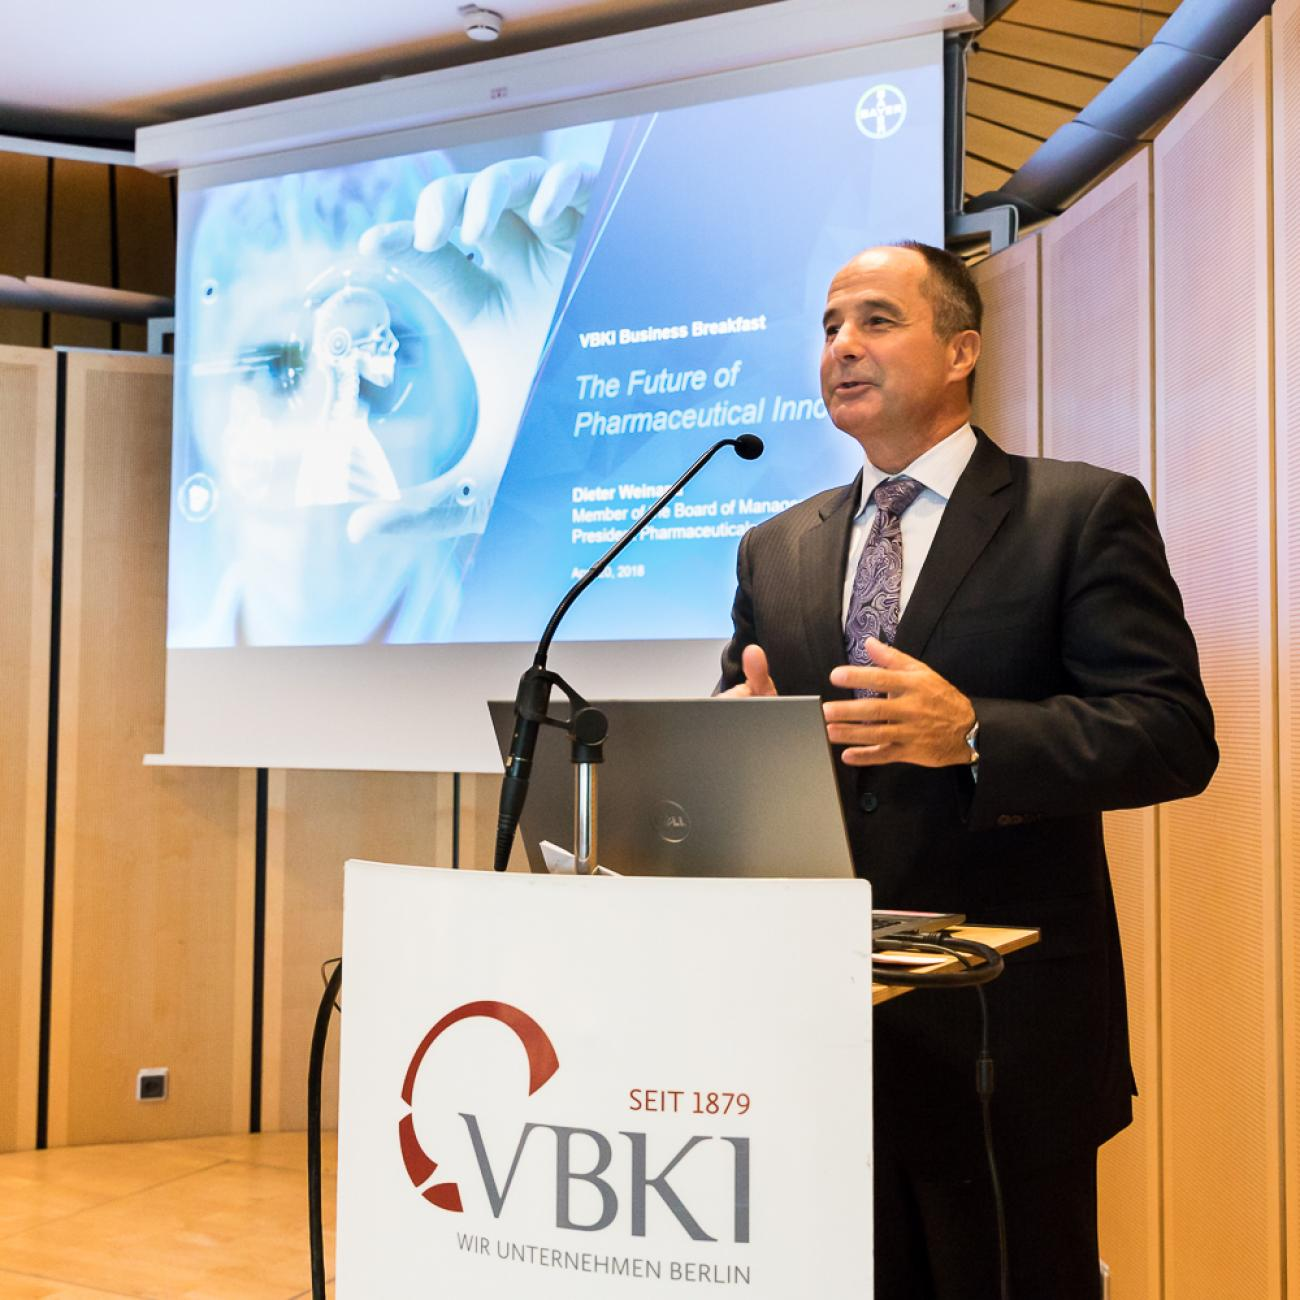 20180420 VBKI Business Breakfast Dieter Weinand Bayer AG 070 BF Inga Haar web?itok=0k1O2uxV